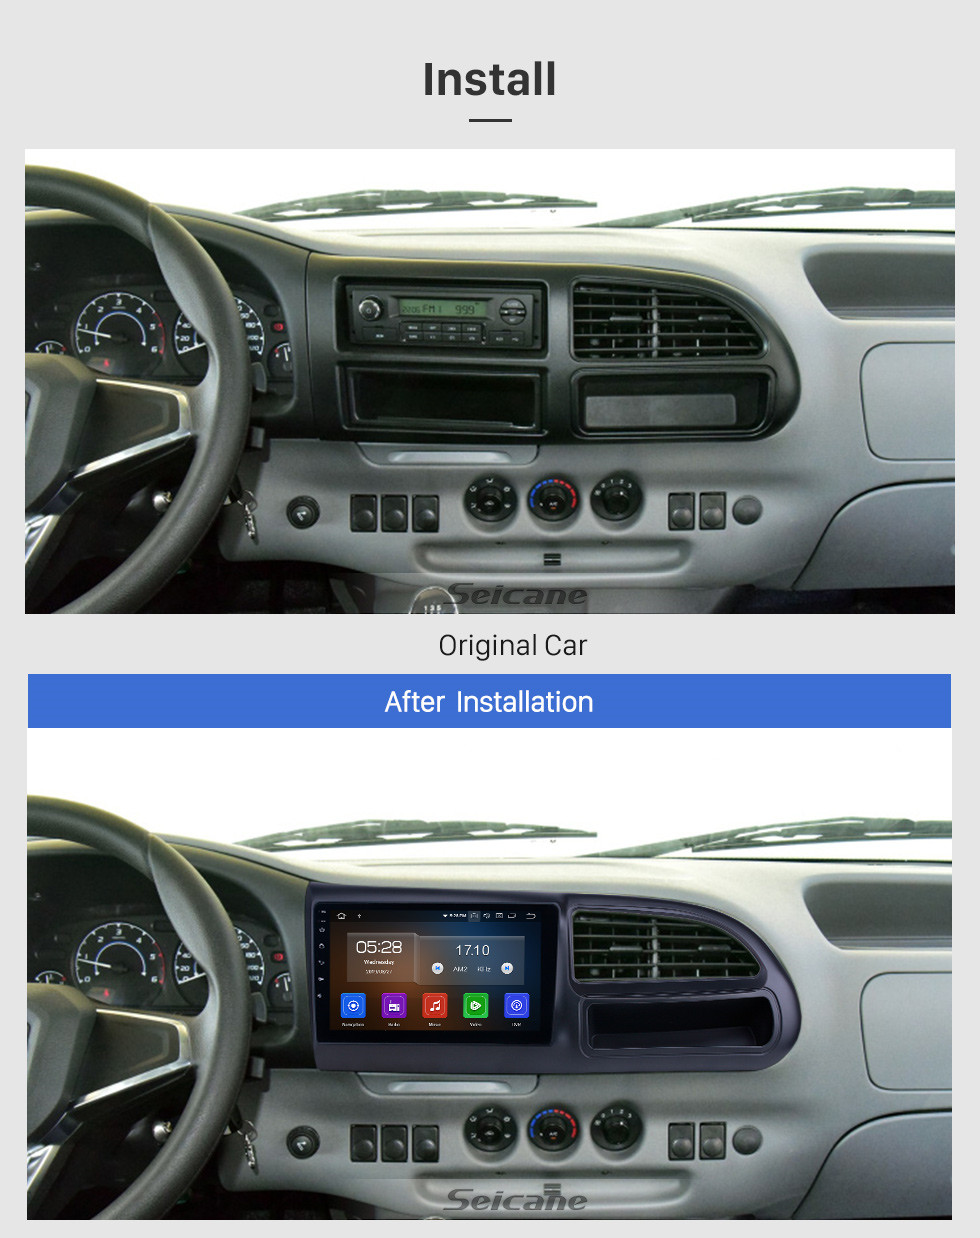 Seicane 2017-2019 Ford Teshun Android 10.0 9 inch GPS Navigation Radio Bluetooth HD Touchscreen USB Carplay support DVR DAB+ SWC